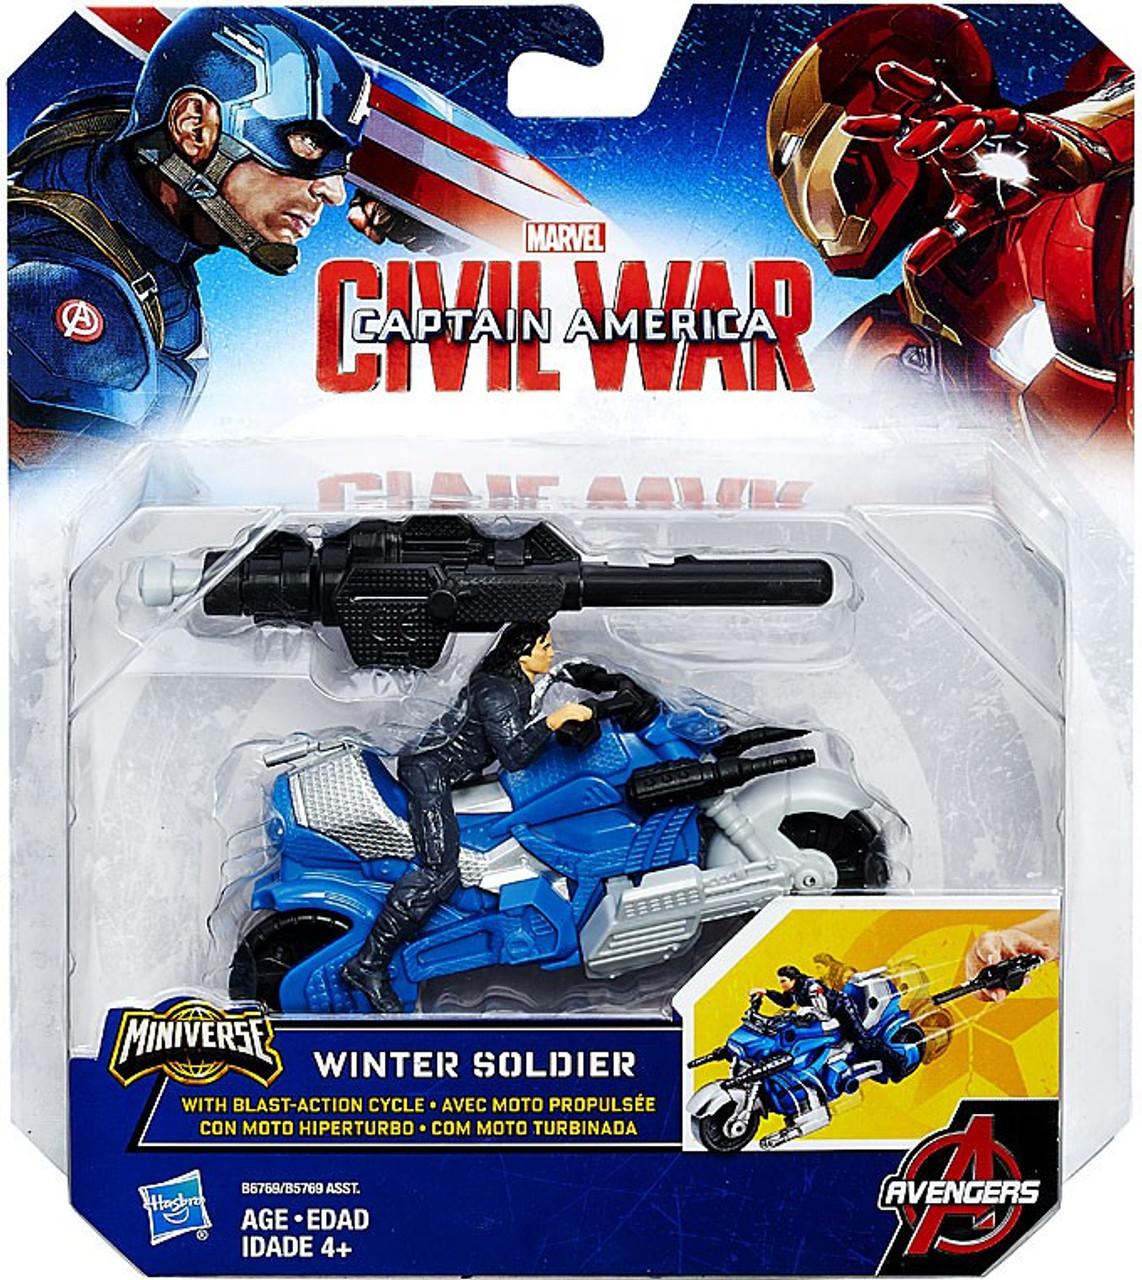 Marvel Captain America Civil War Captain America with Blast-Action 4x4